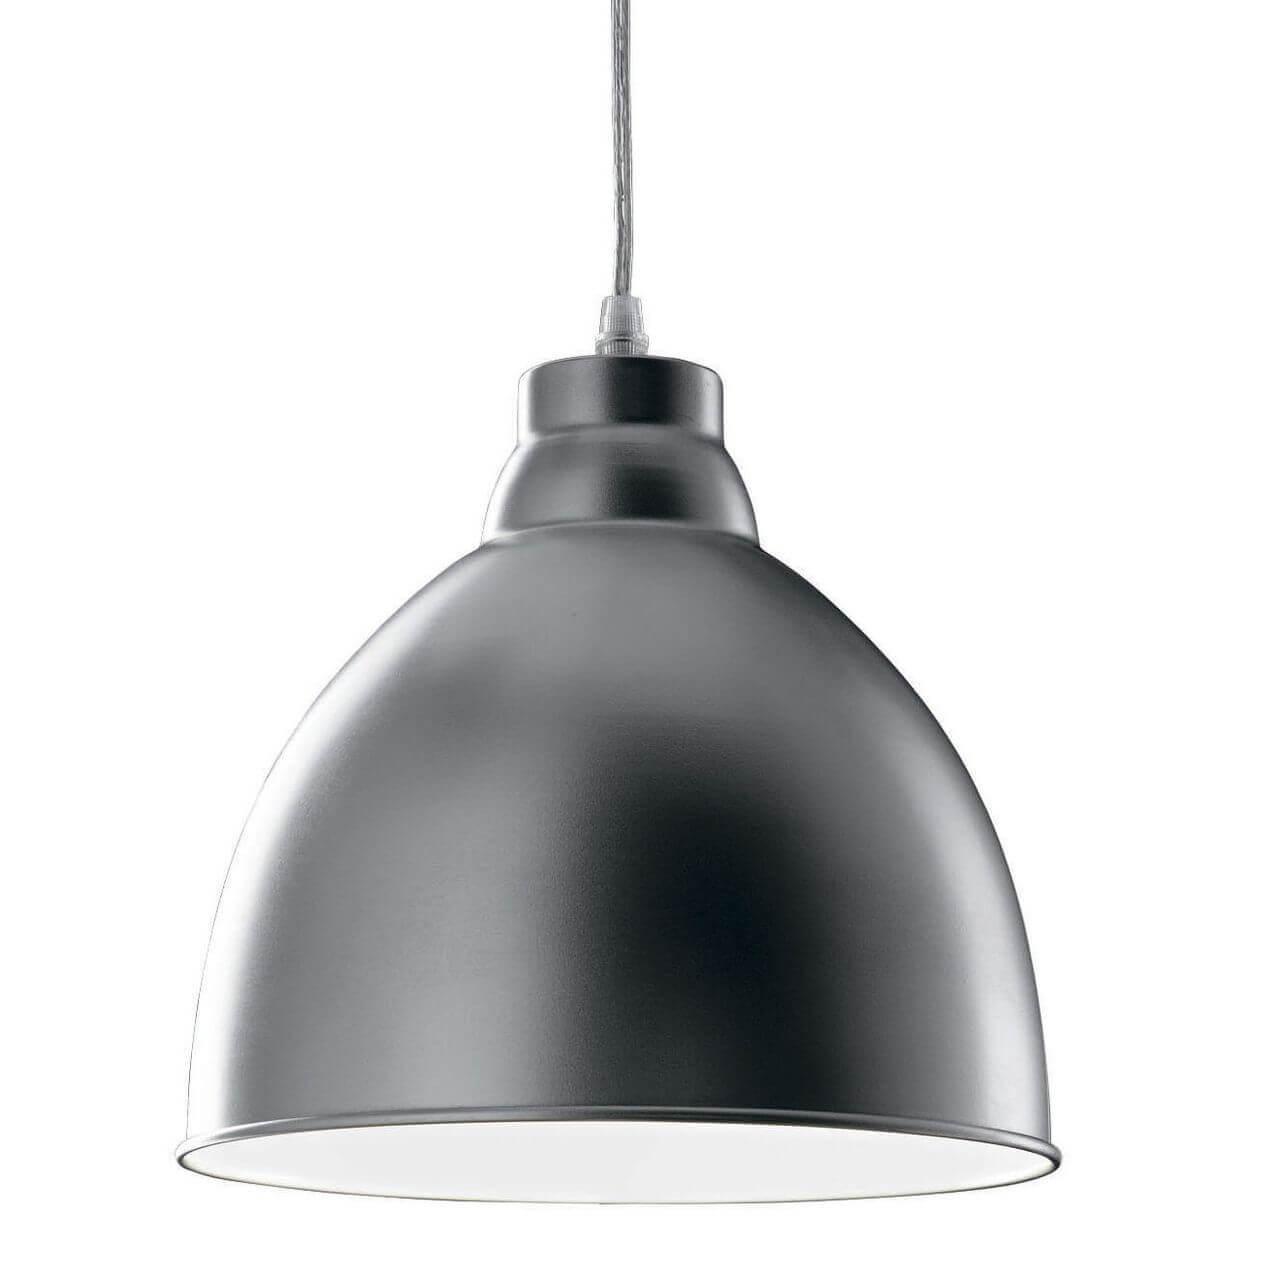 Светильник Ideal Lux Navy SP1 Alluminio